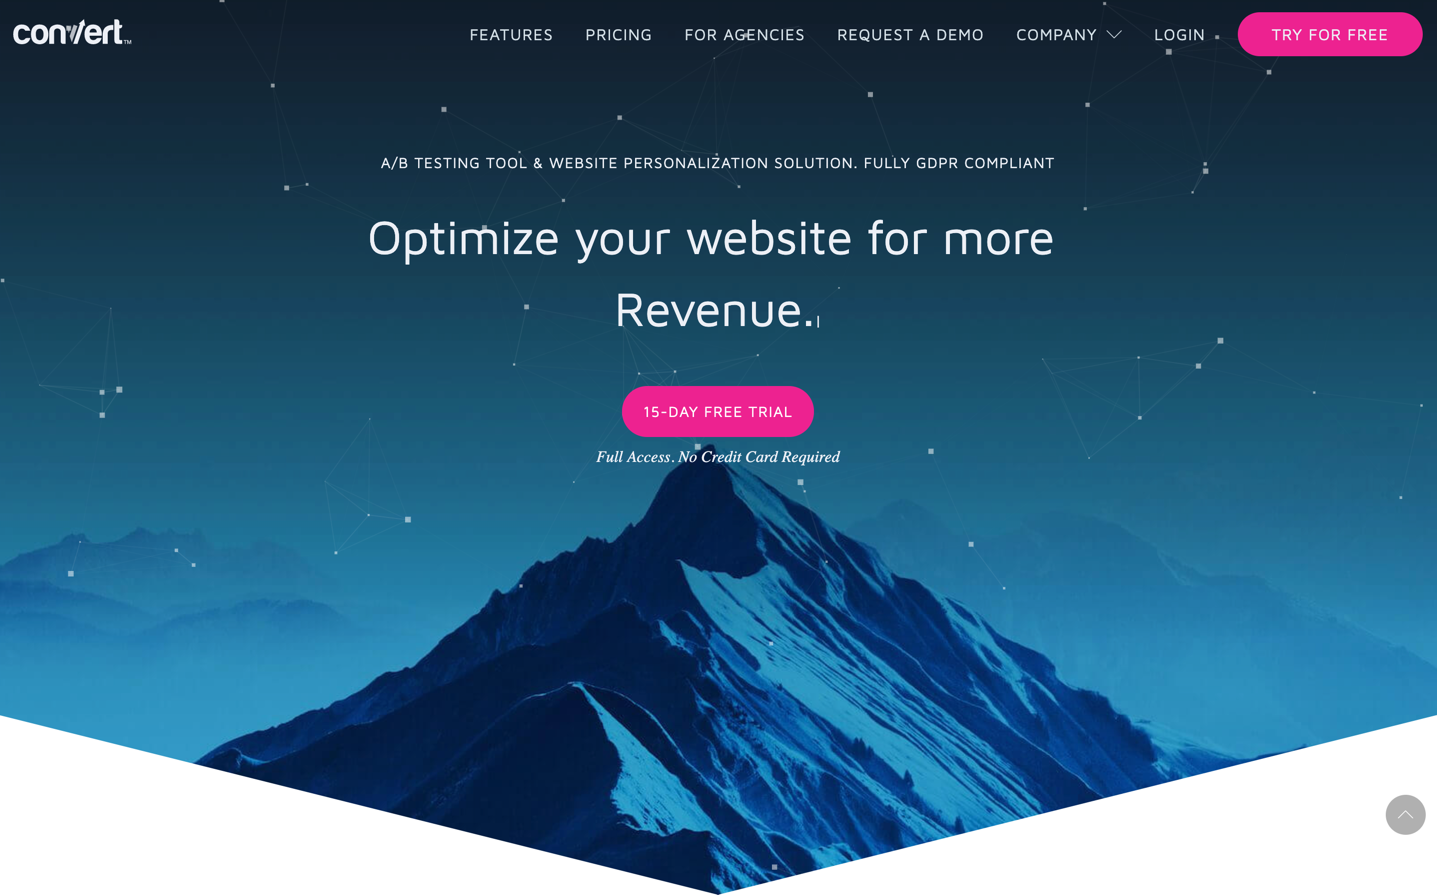 convert homepage